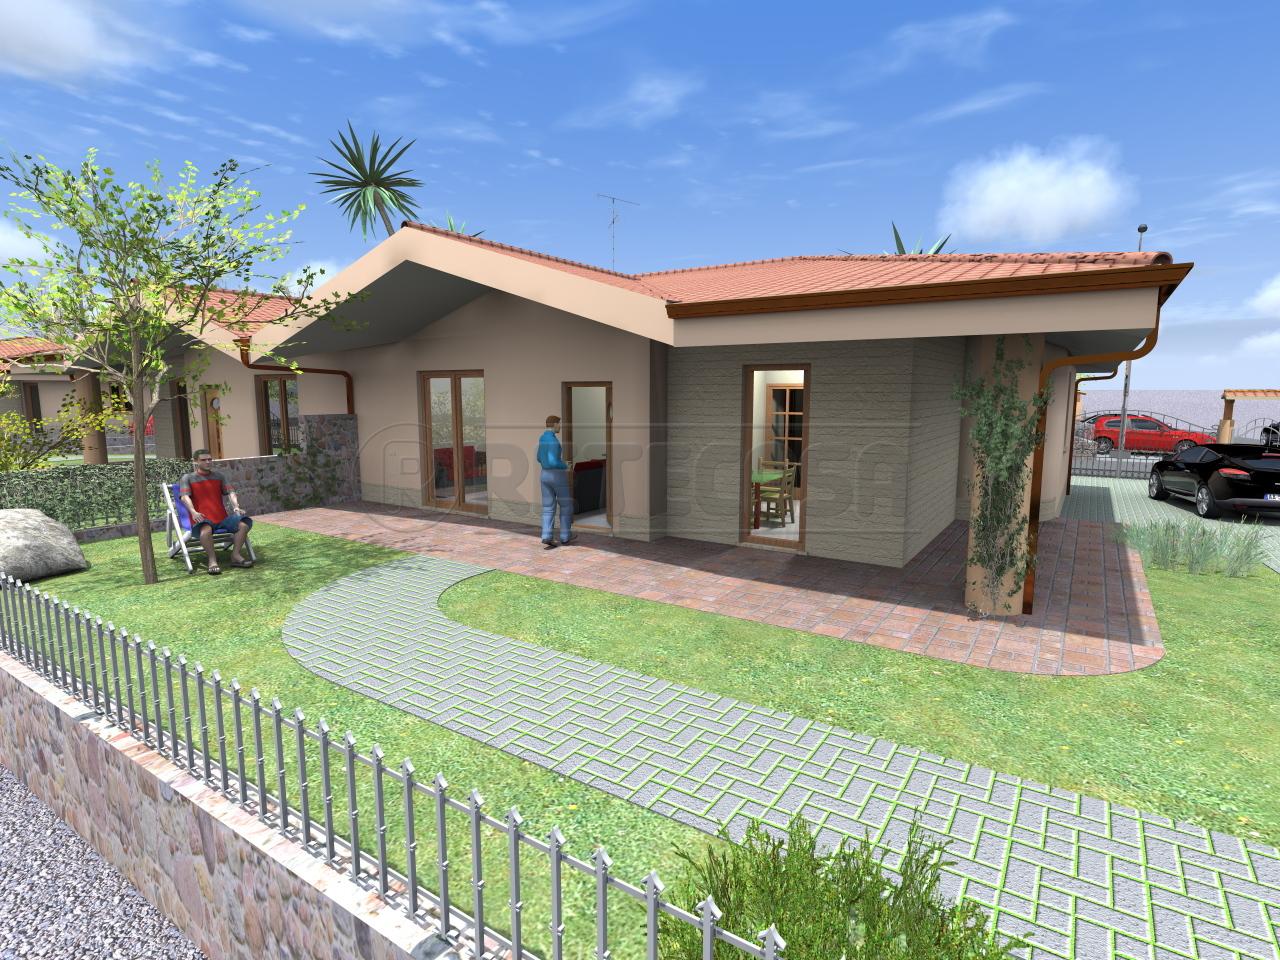 Villa in vendita Rif. 4128804